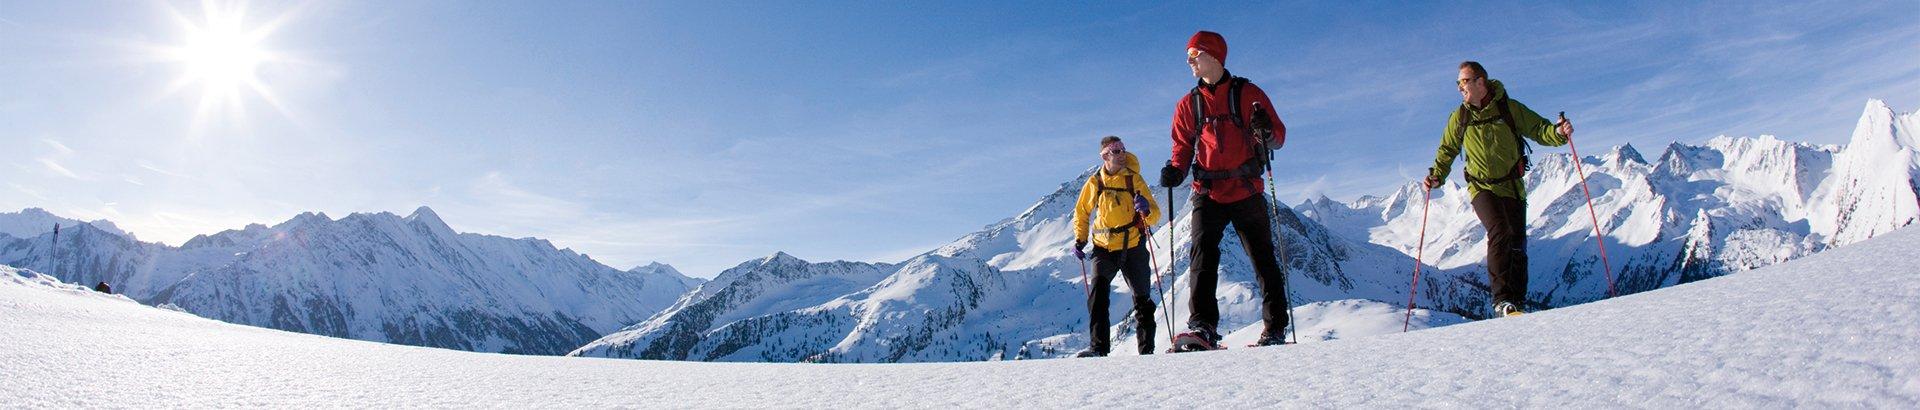 Schneeschuhwanderung Sporthotel Theresa